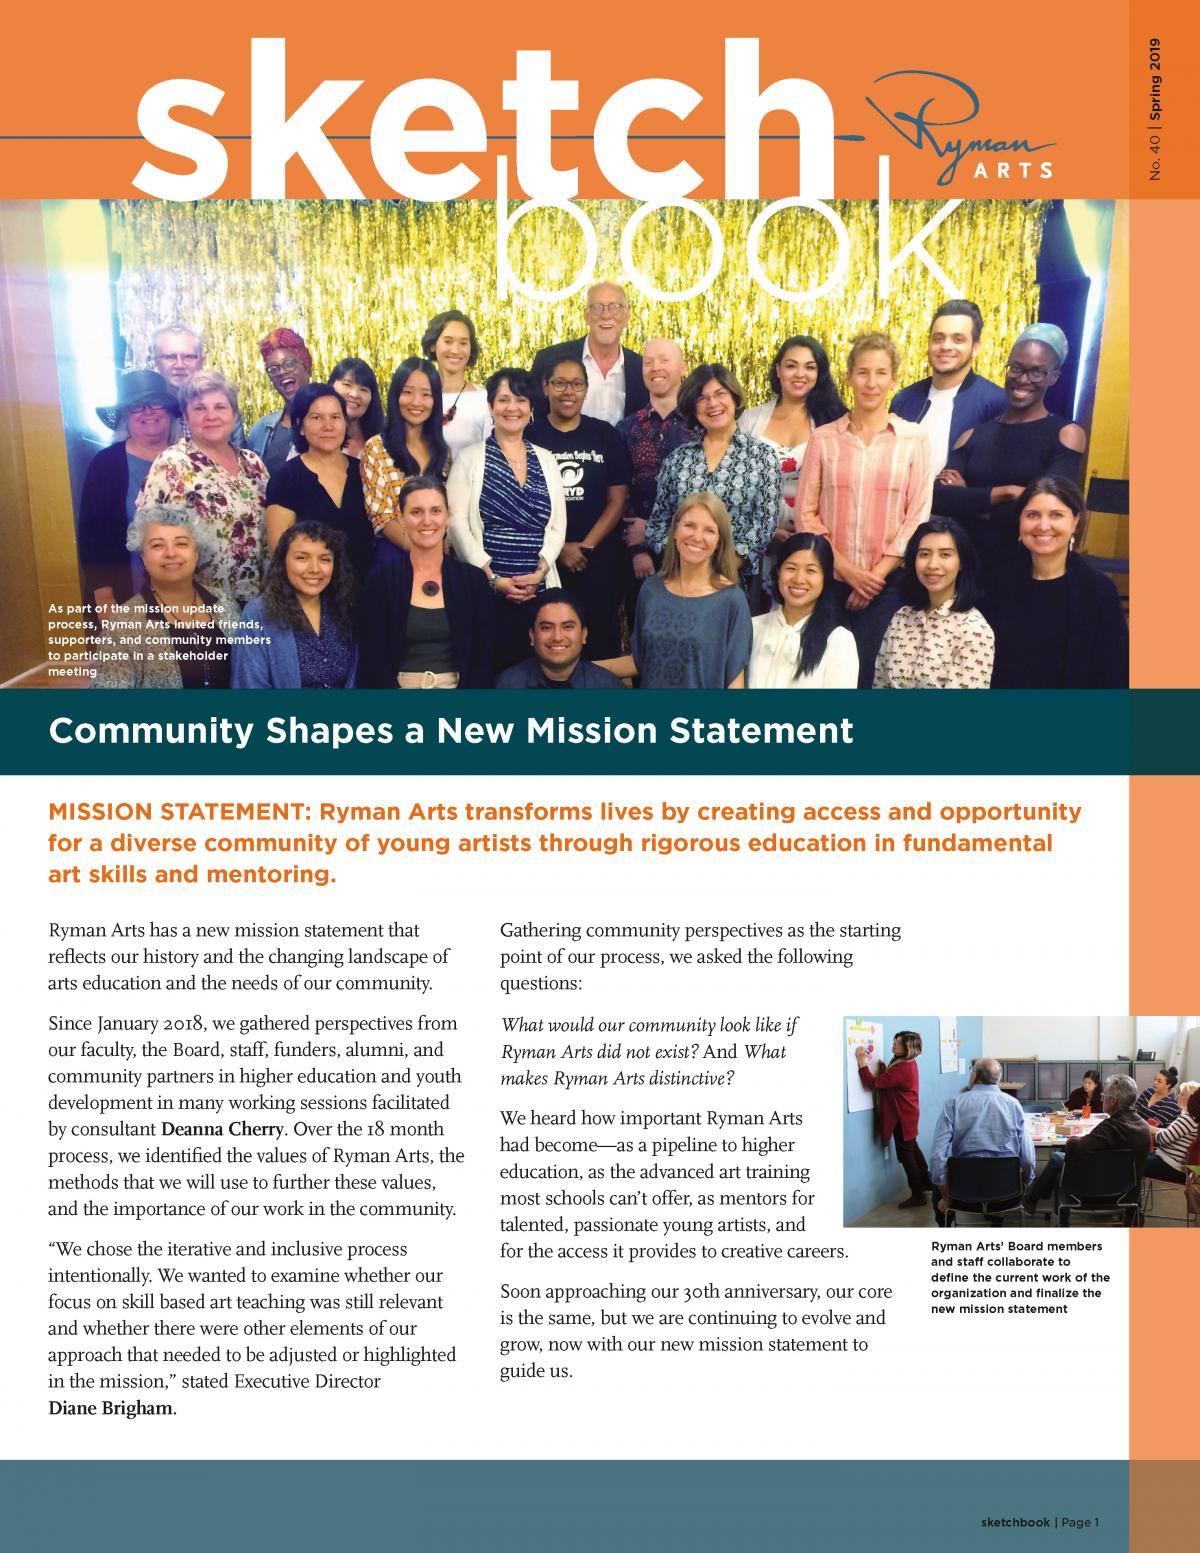 Ryman Arts Sketchbook Number 40, Spring 2019: Community Shapes a New Mission Statement